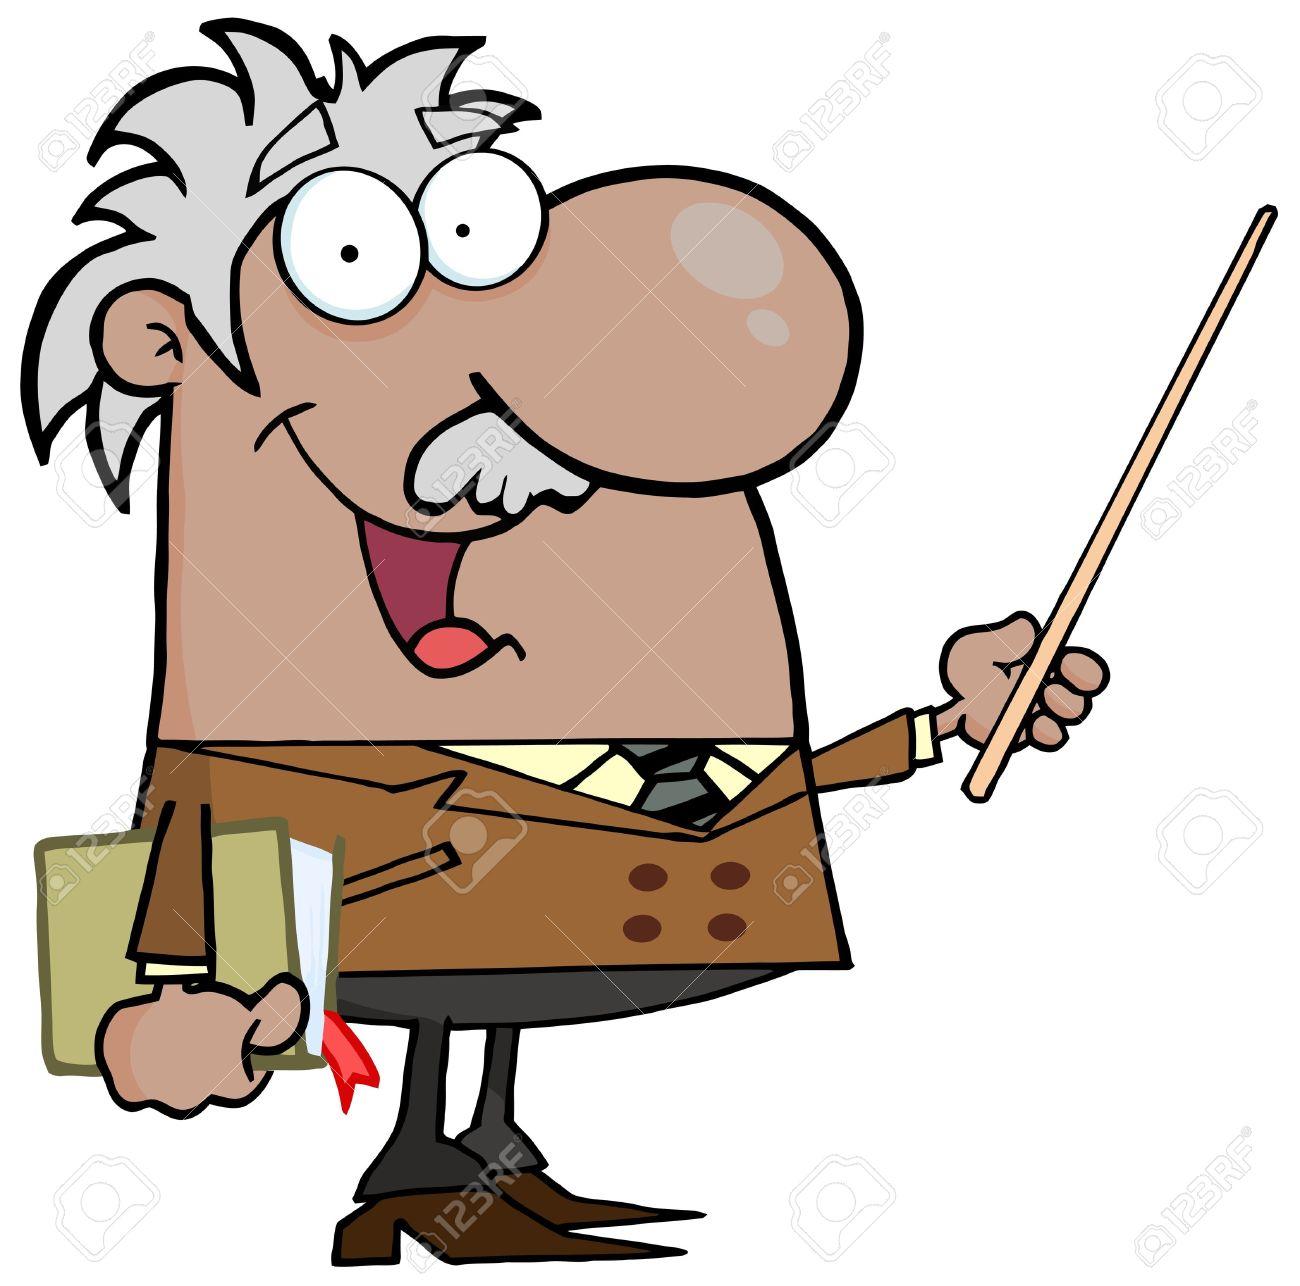 Happy Black Or Hispanic Professor Using A Pointer Stick Stock Vector - 13299042